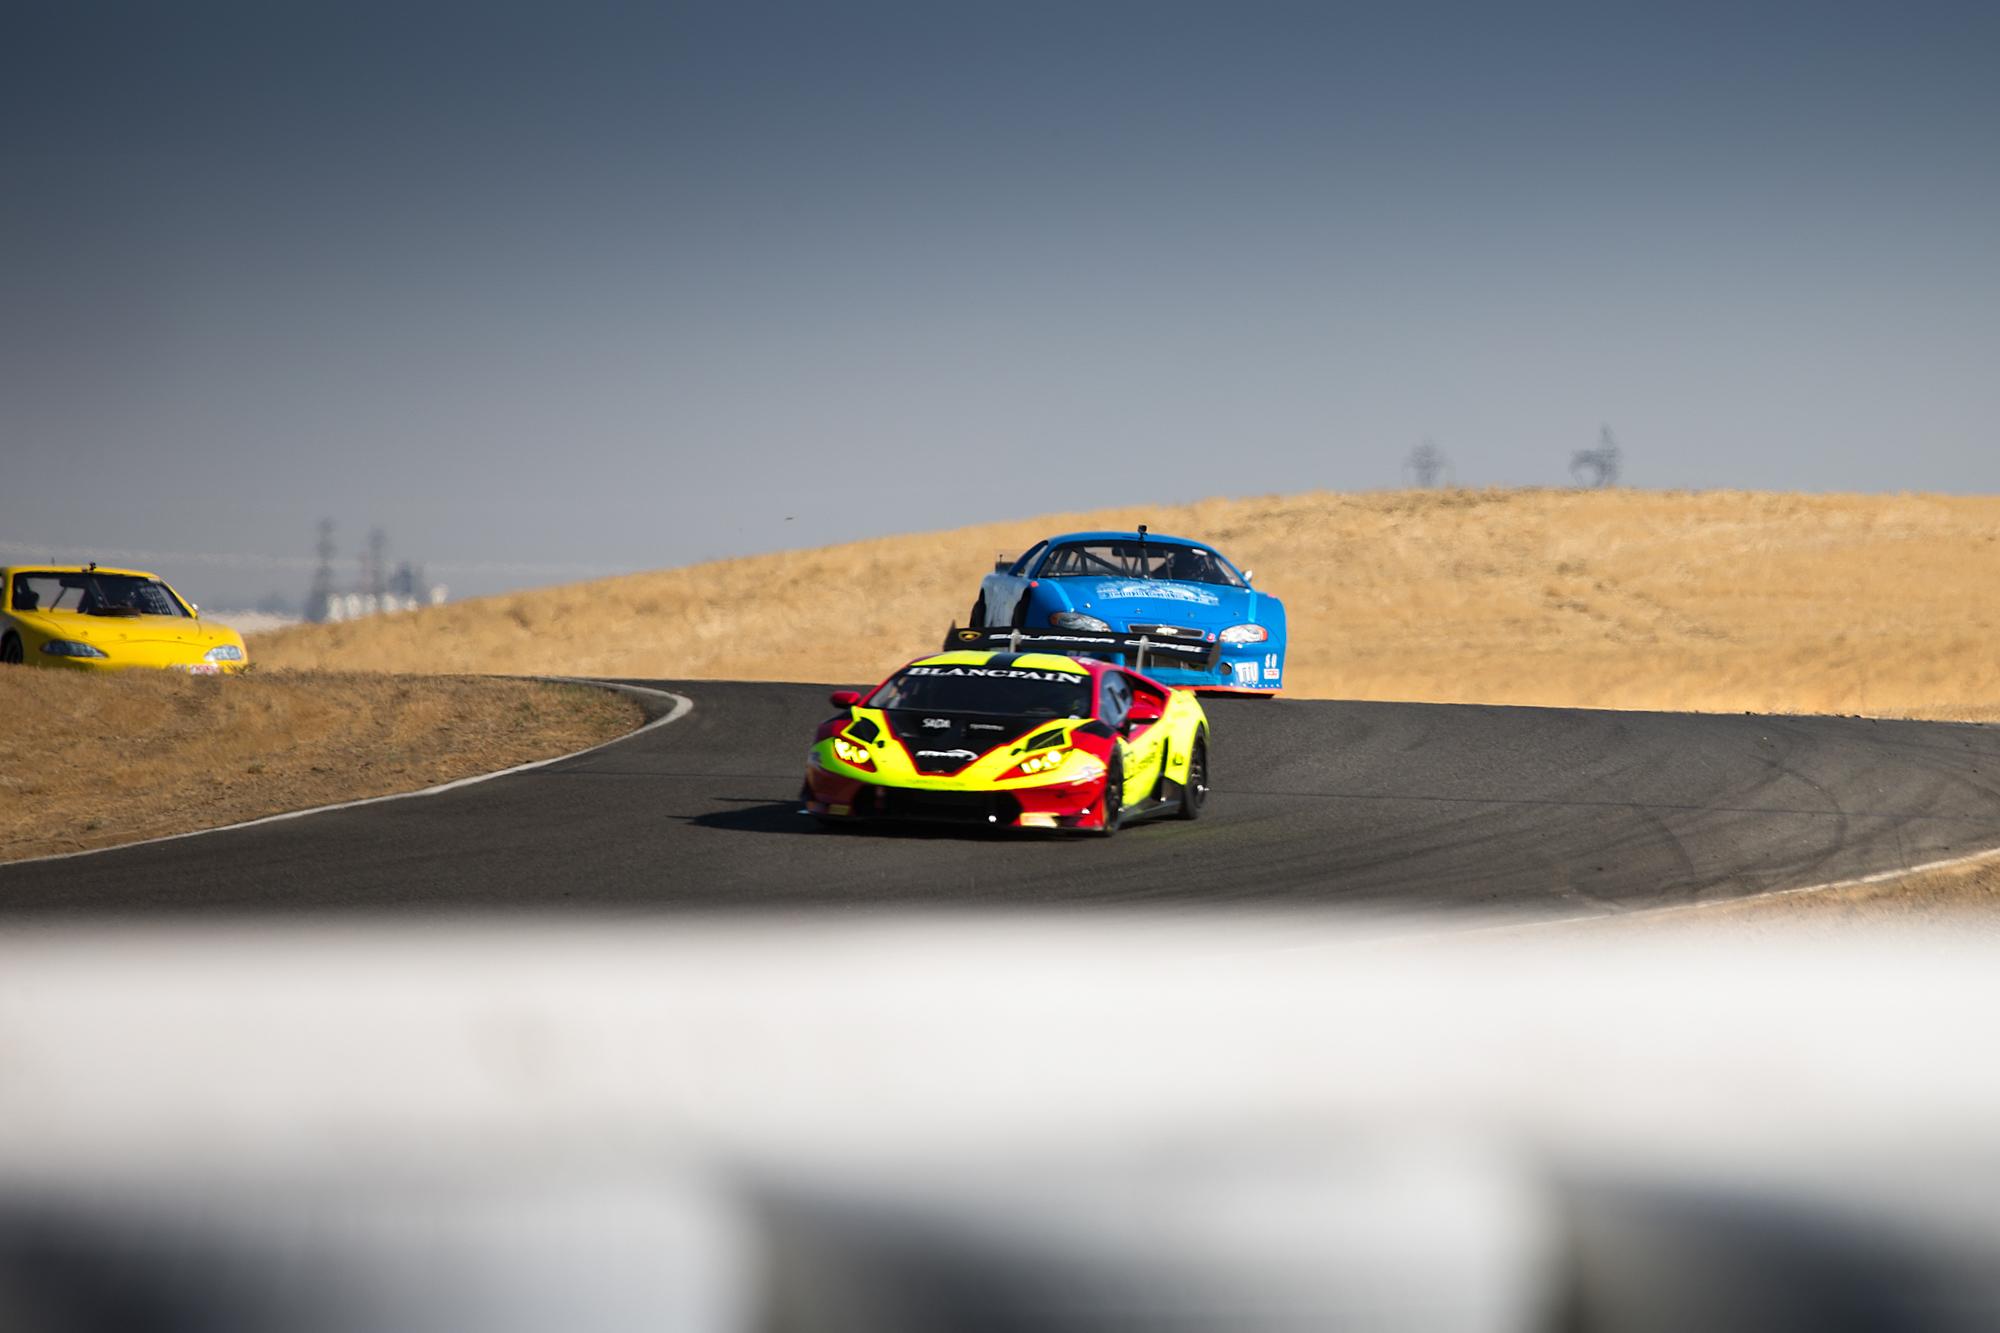 Steven-Racing-20171006-45118.jpg